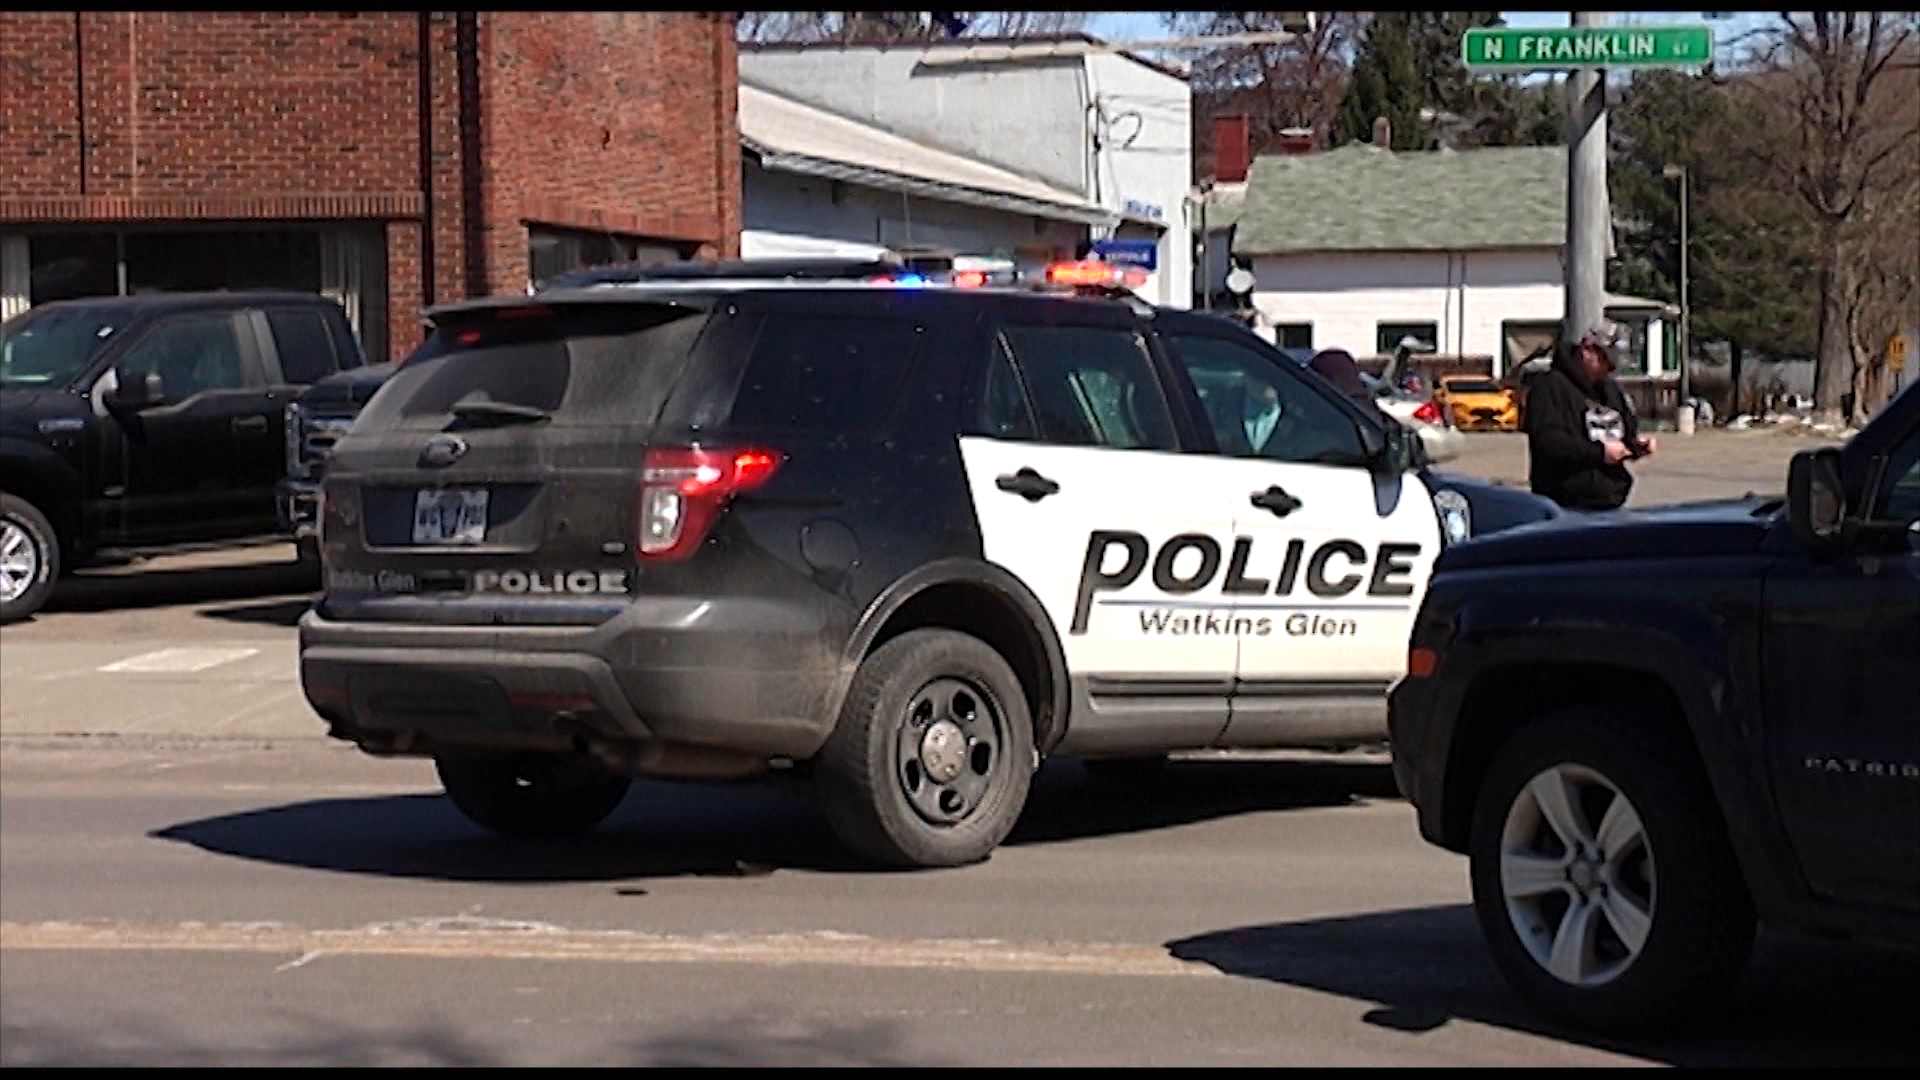 Watkins Glen Police